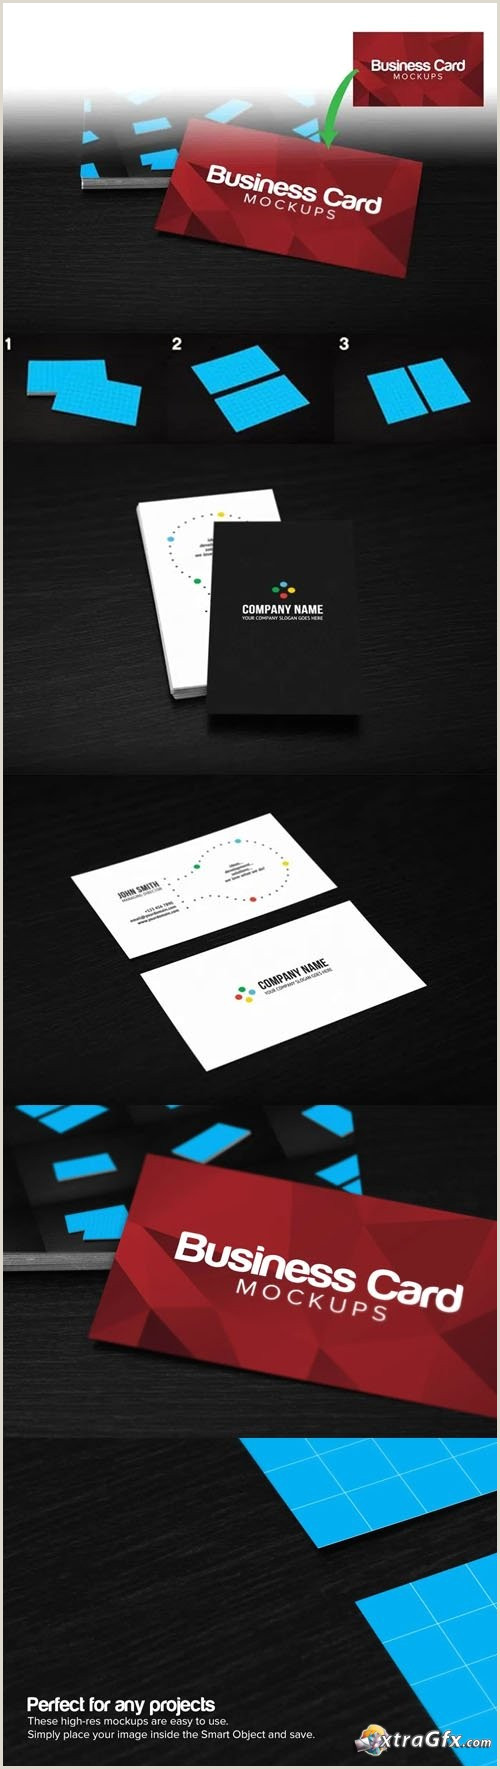 Vertical Business Card Design Business Card Mockup 85×55 Free